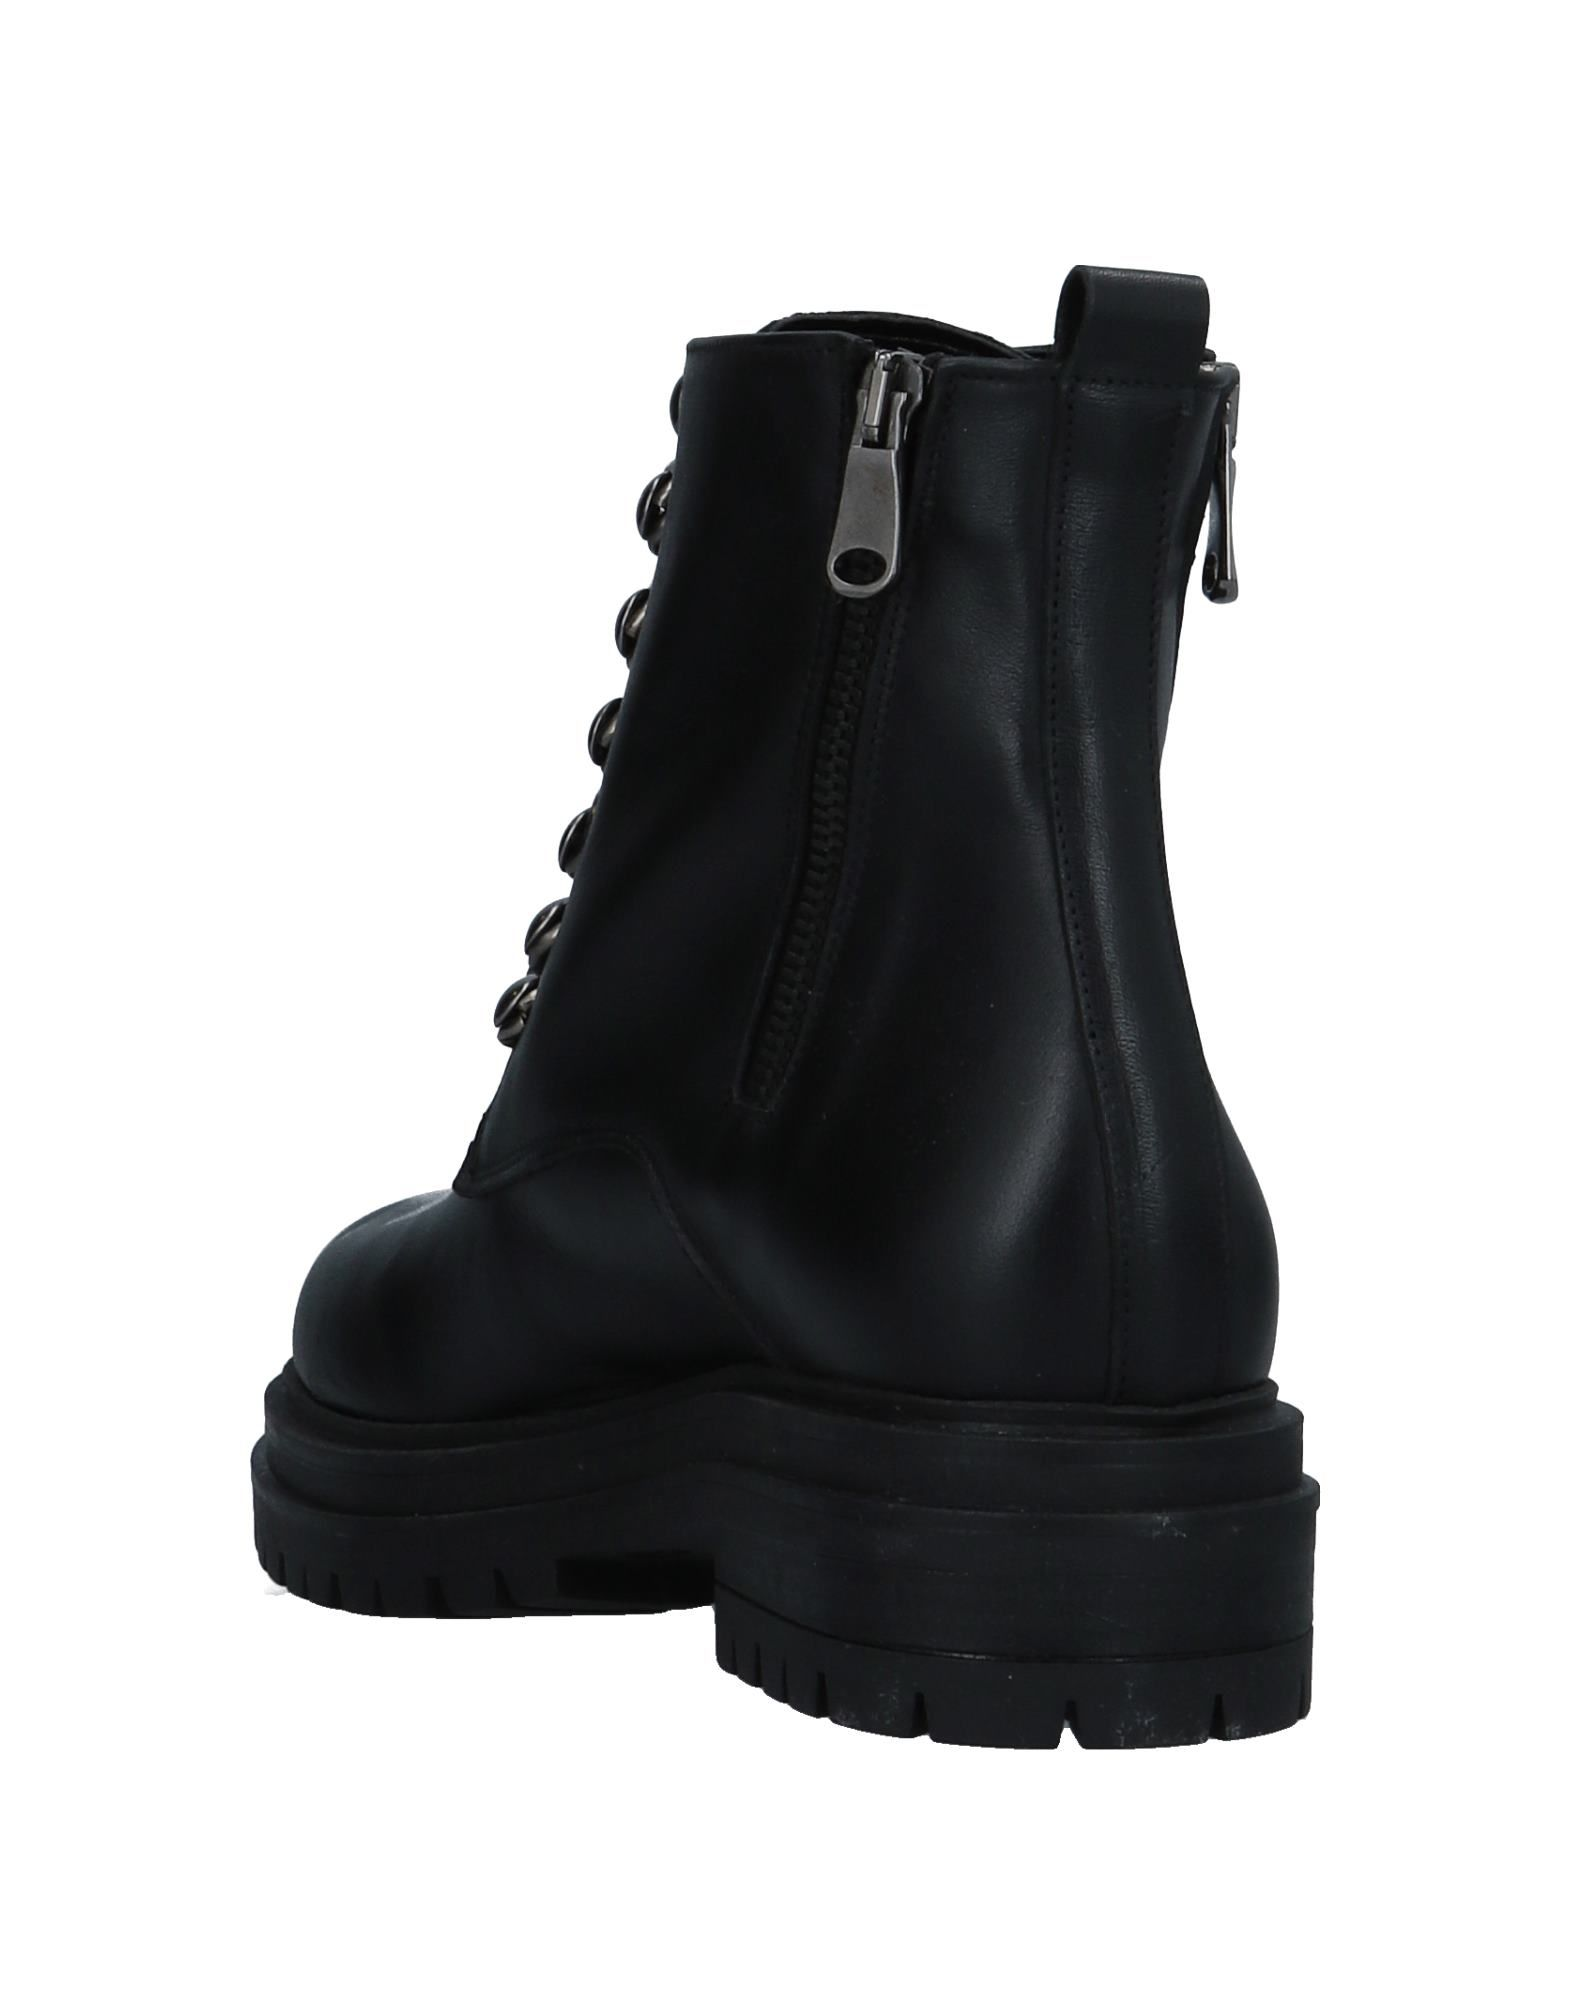 Stilvolle billige Stiefelette Schuhe J.Born Stiefelette billige Damen  11532920TT 24984a